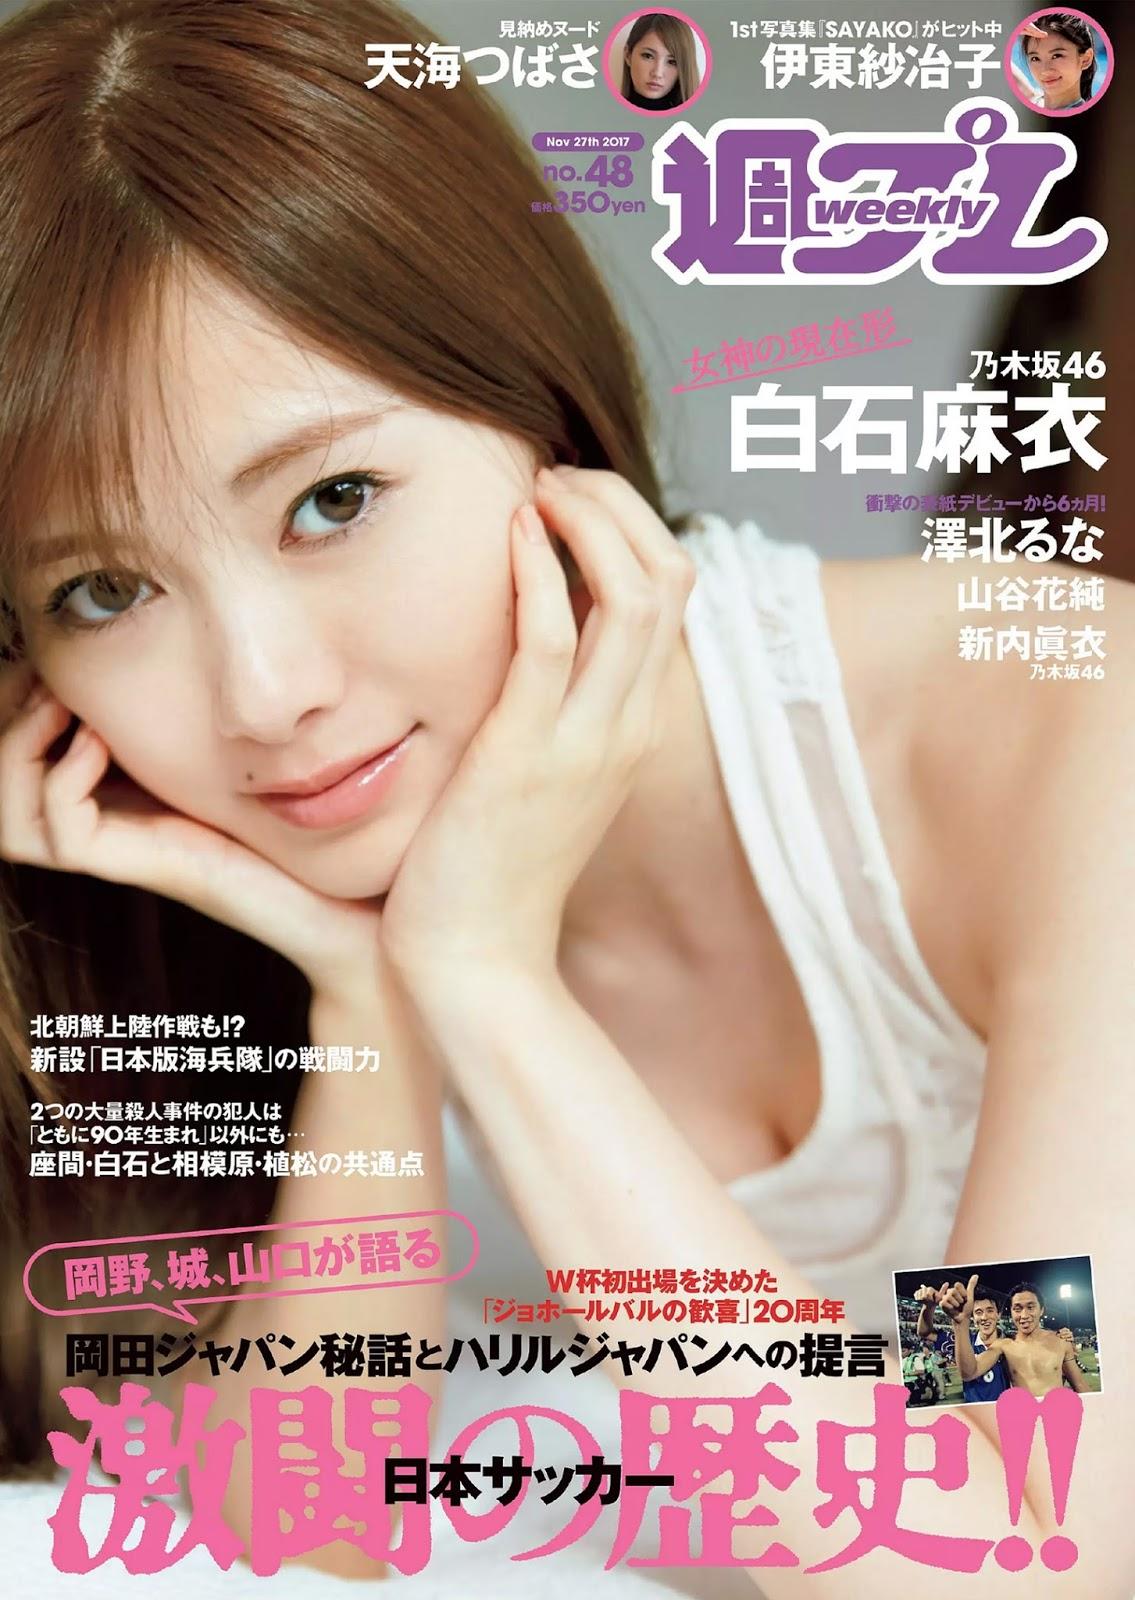 Shiraishi Mai 白石麻衣, Weekly Playboy 2017 No.48 (週刊プレイボーイ 2017年48号)